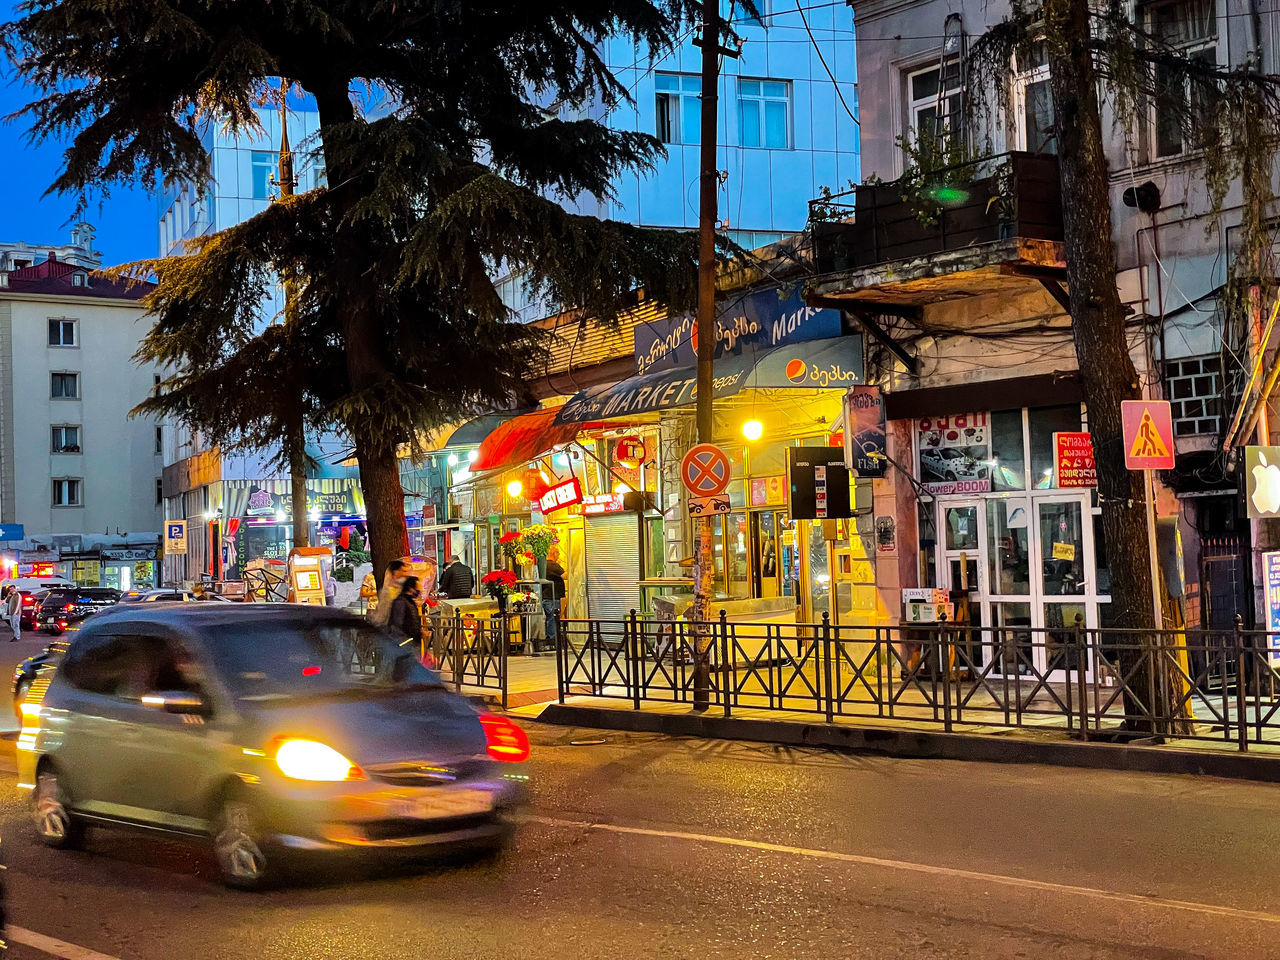 ILLUMINATED CITY STREET BY BUILDING AT NIGHT